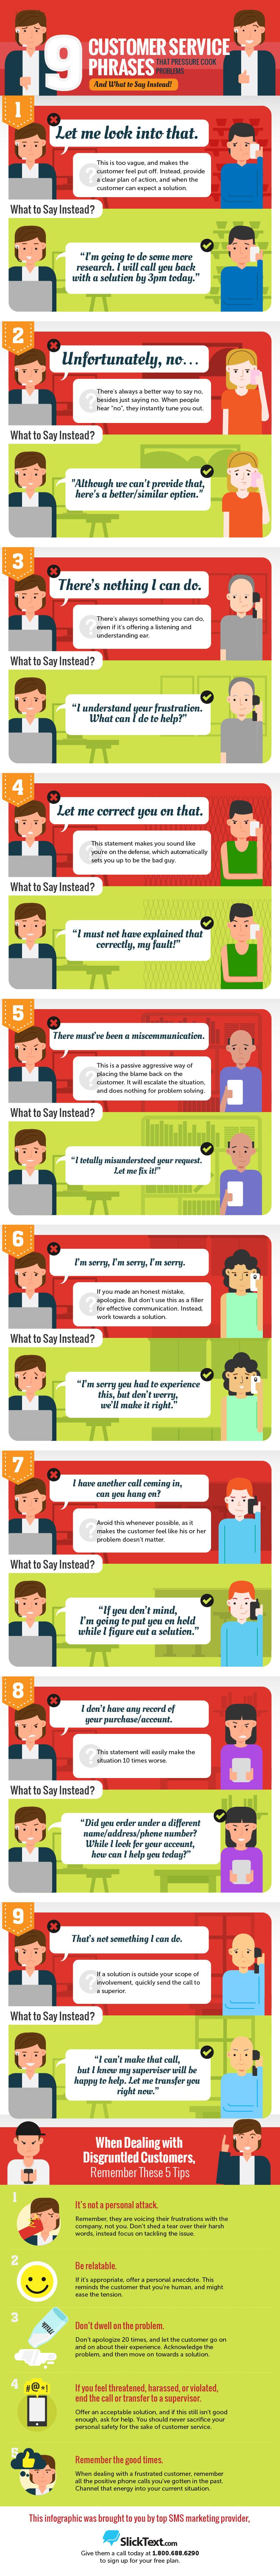 Avoid Bad Customer Service Phrases